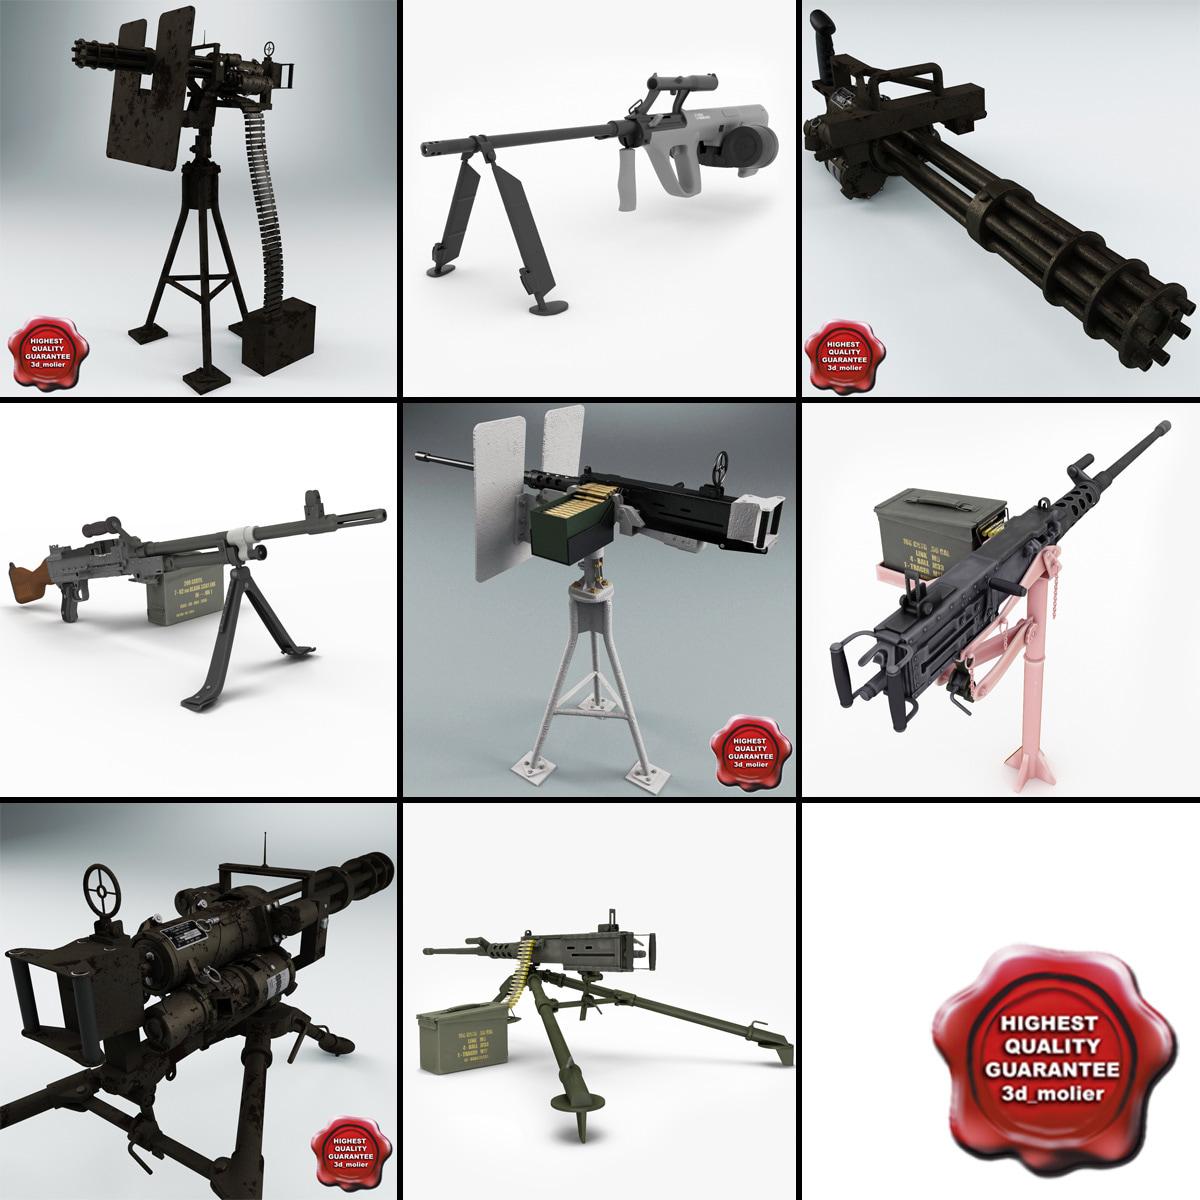 Machine_Guns_Collection_V3_000.jpg